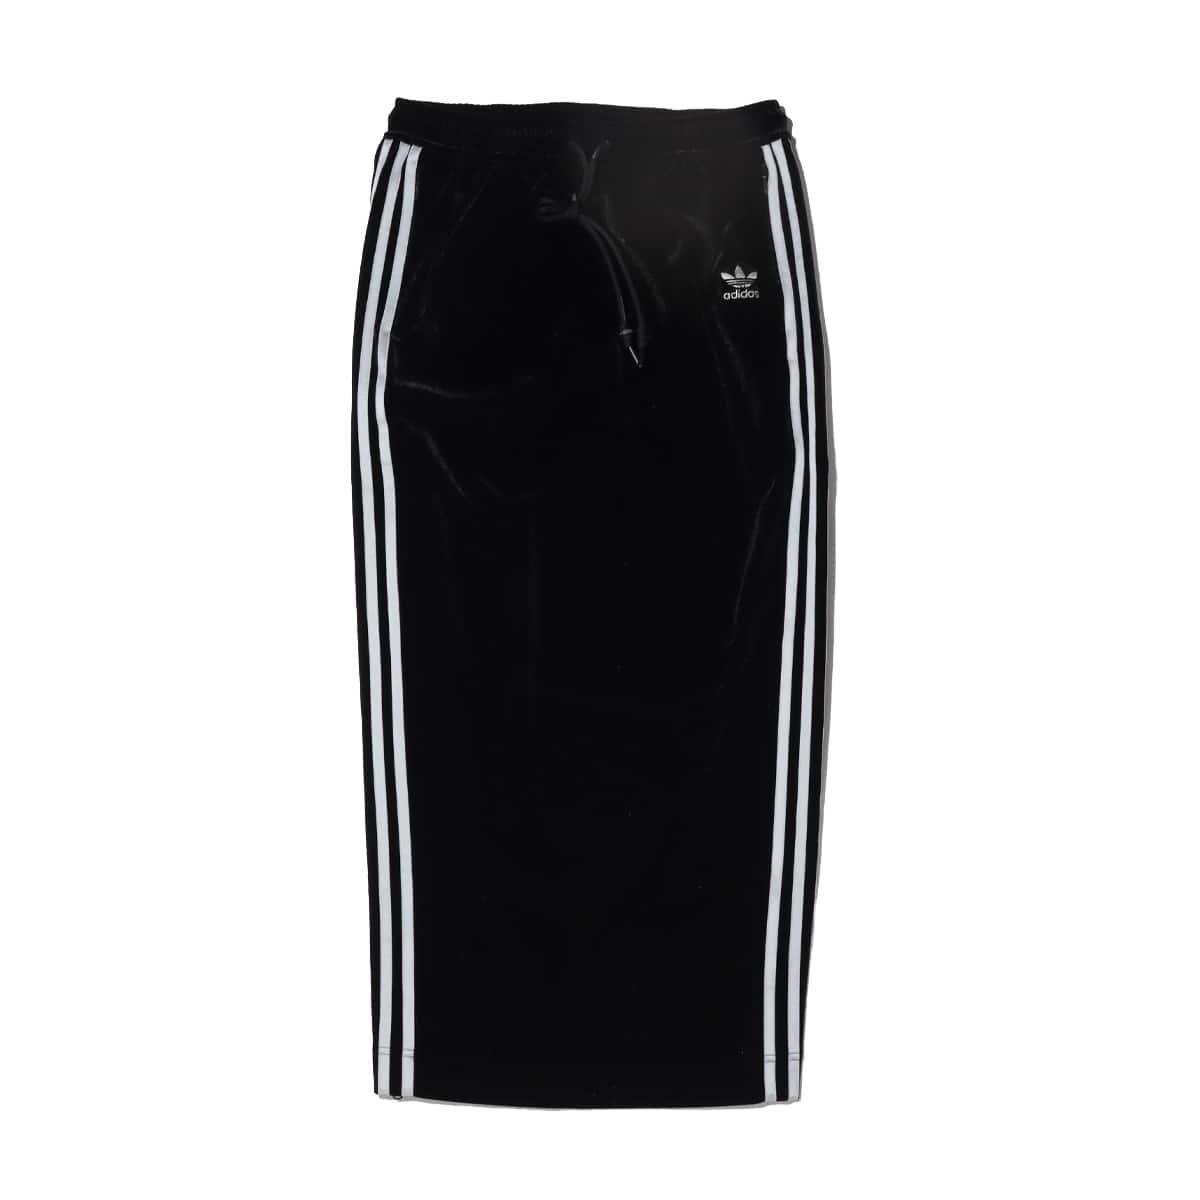 adidas Consortium LONG SKIRT AC BLACK 20FW-S_photo_large